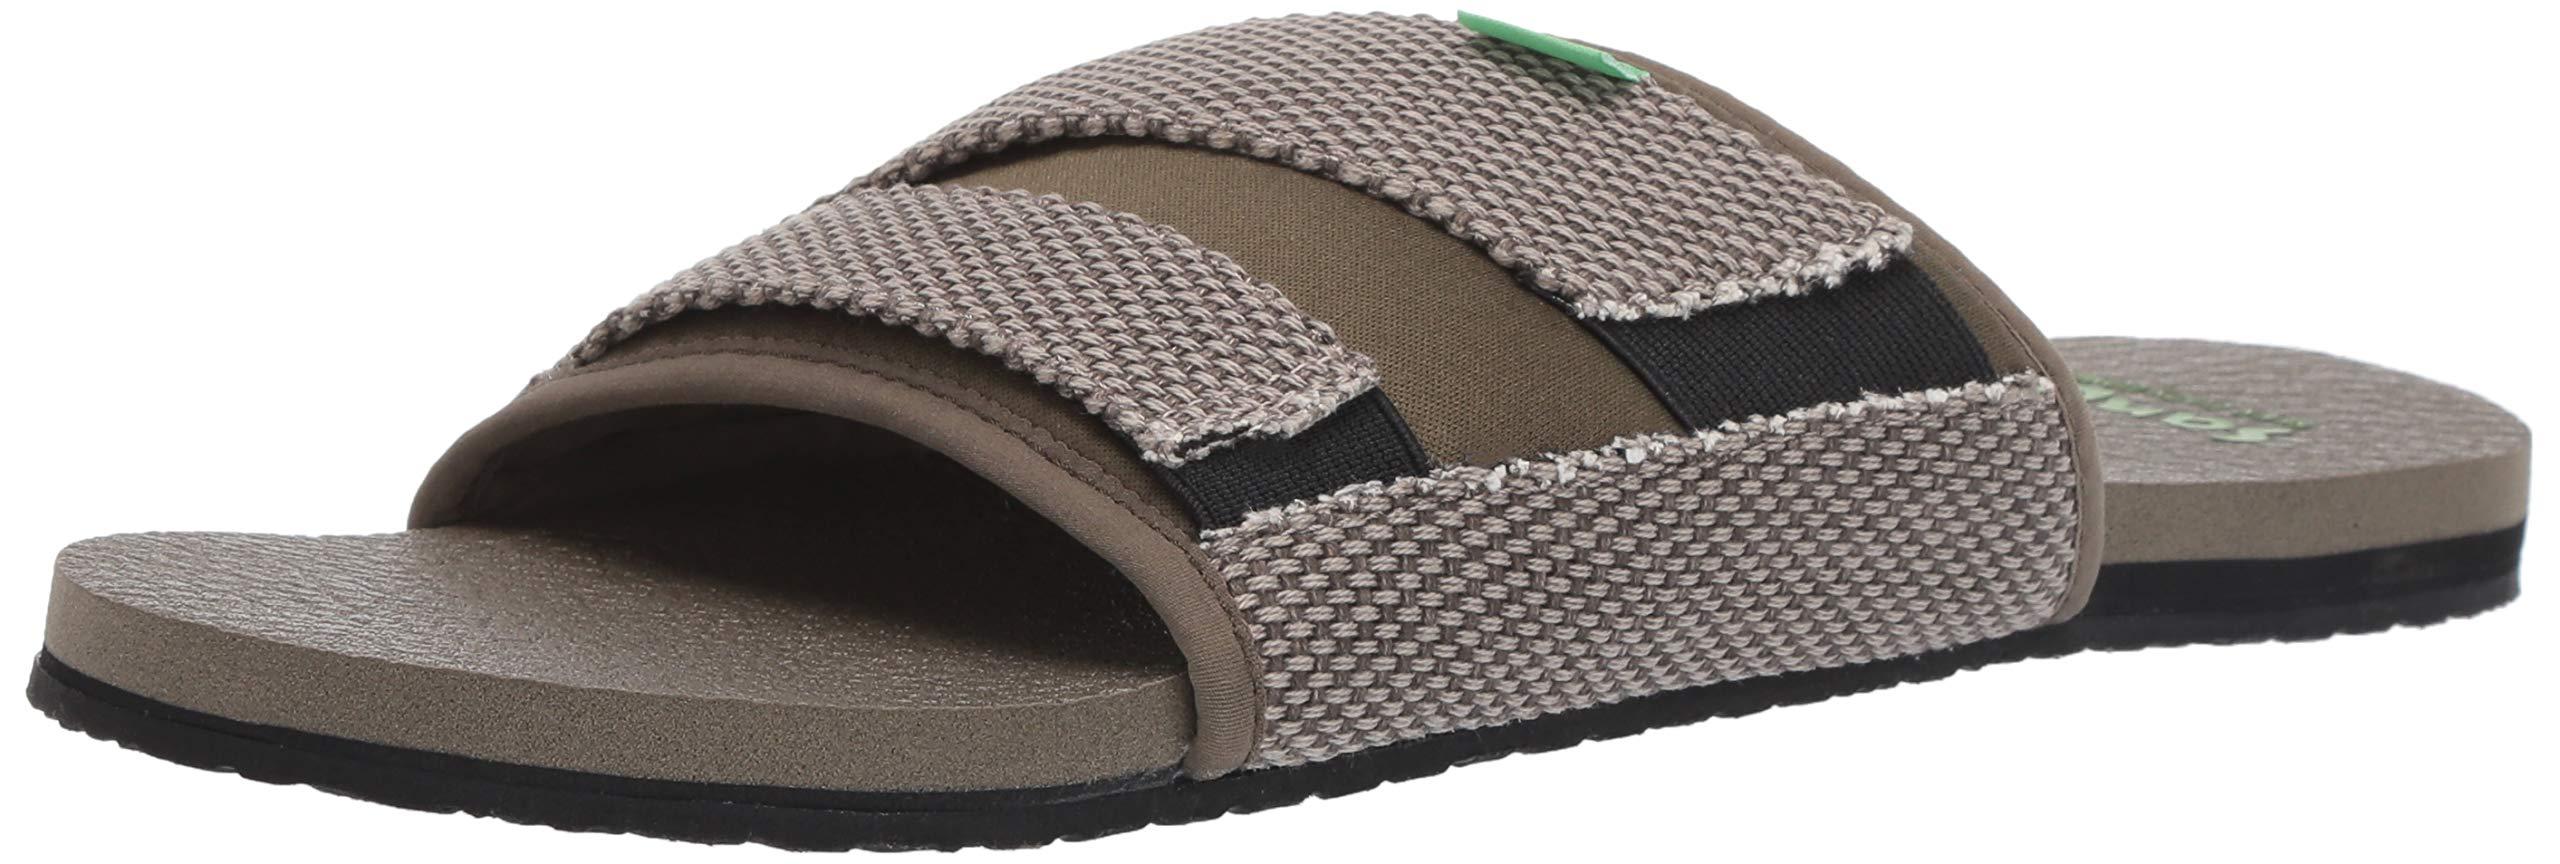 Sanuk-Men-039-s-Beer-Cozy-2-Slide-Sandal-Choose-SZ-color thumbnail 11